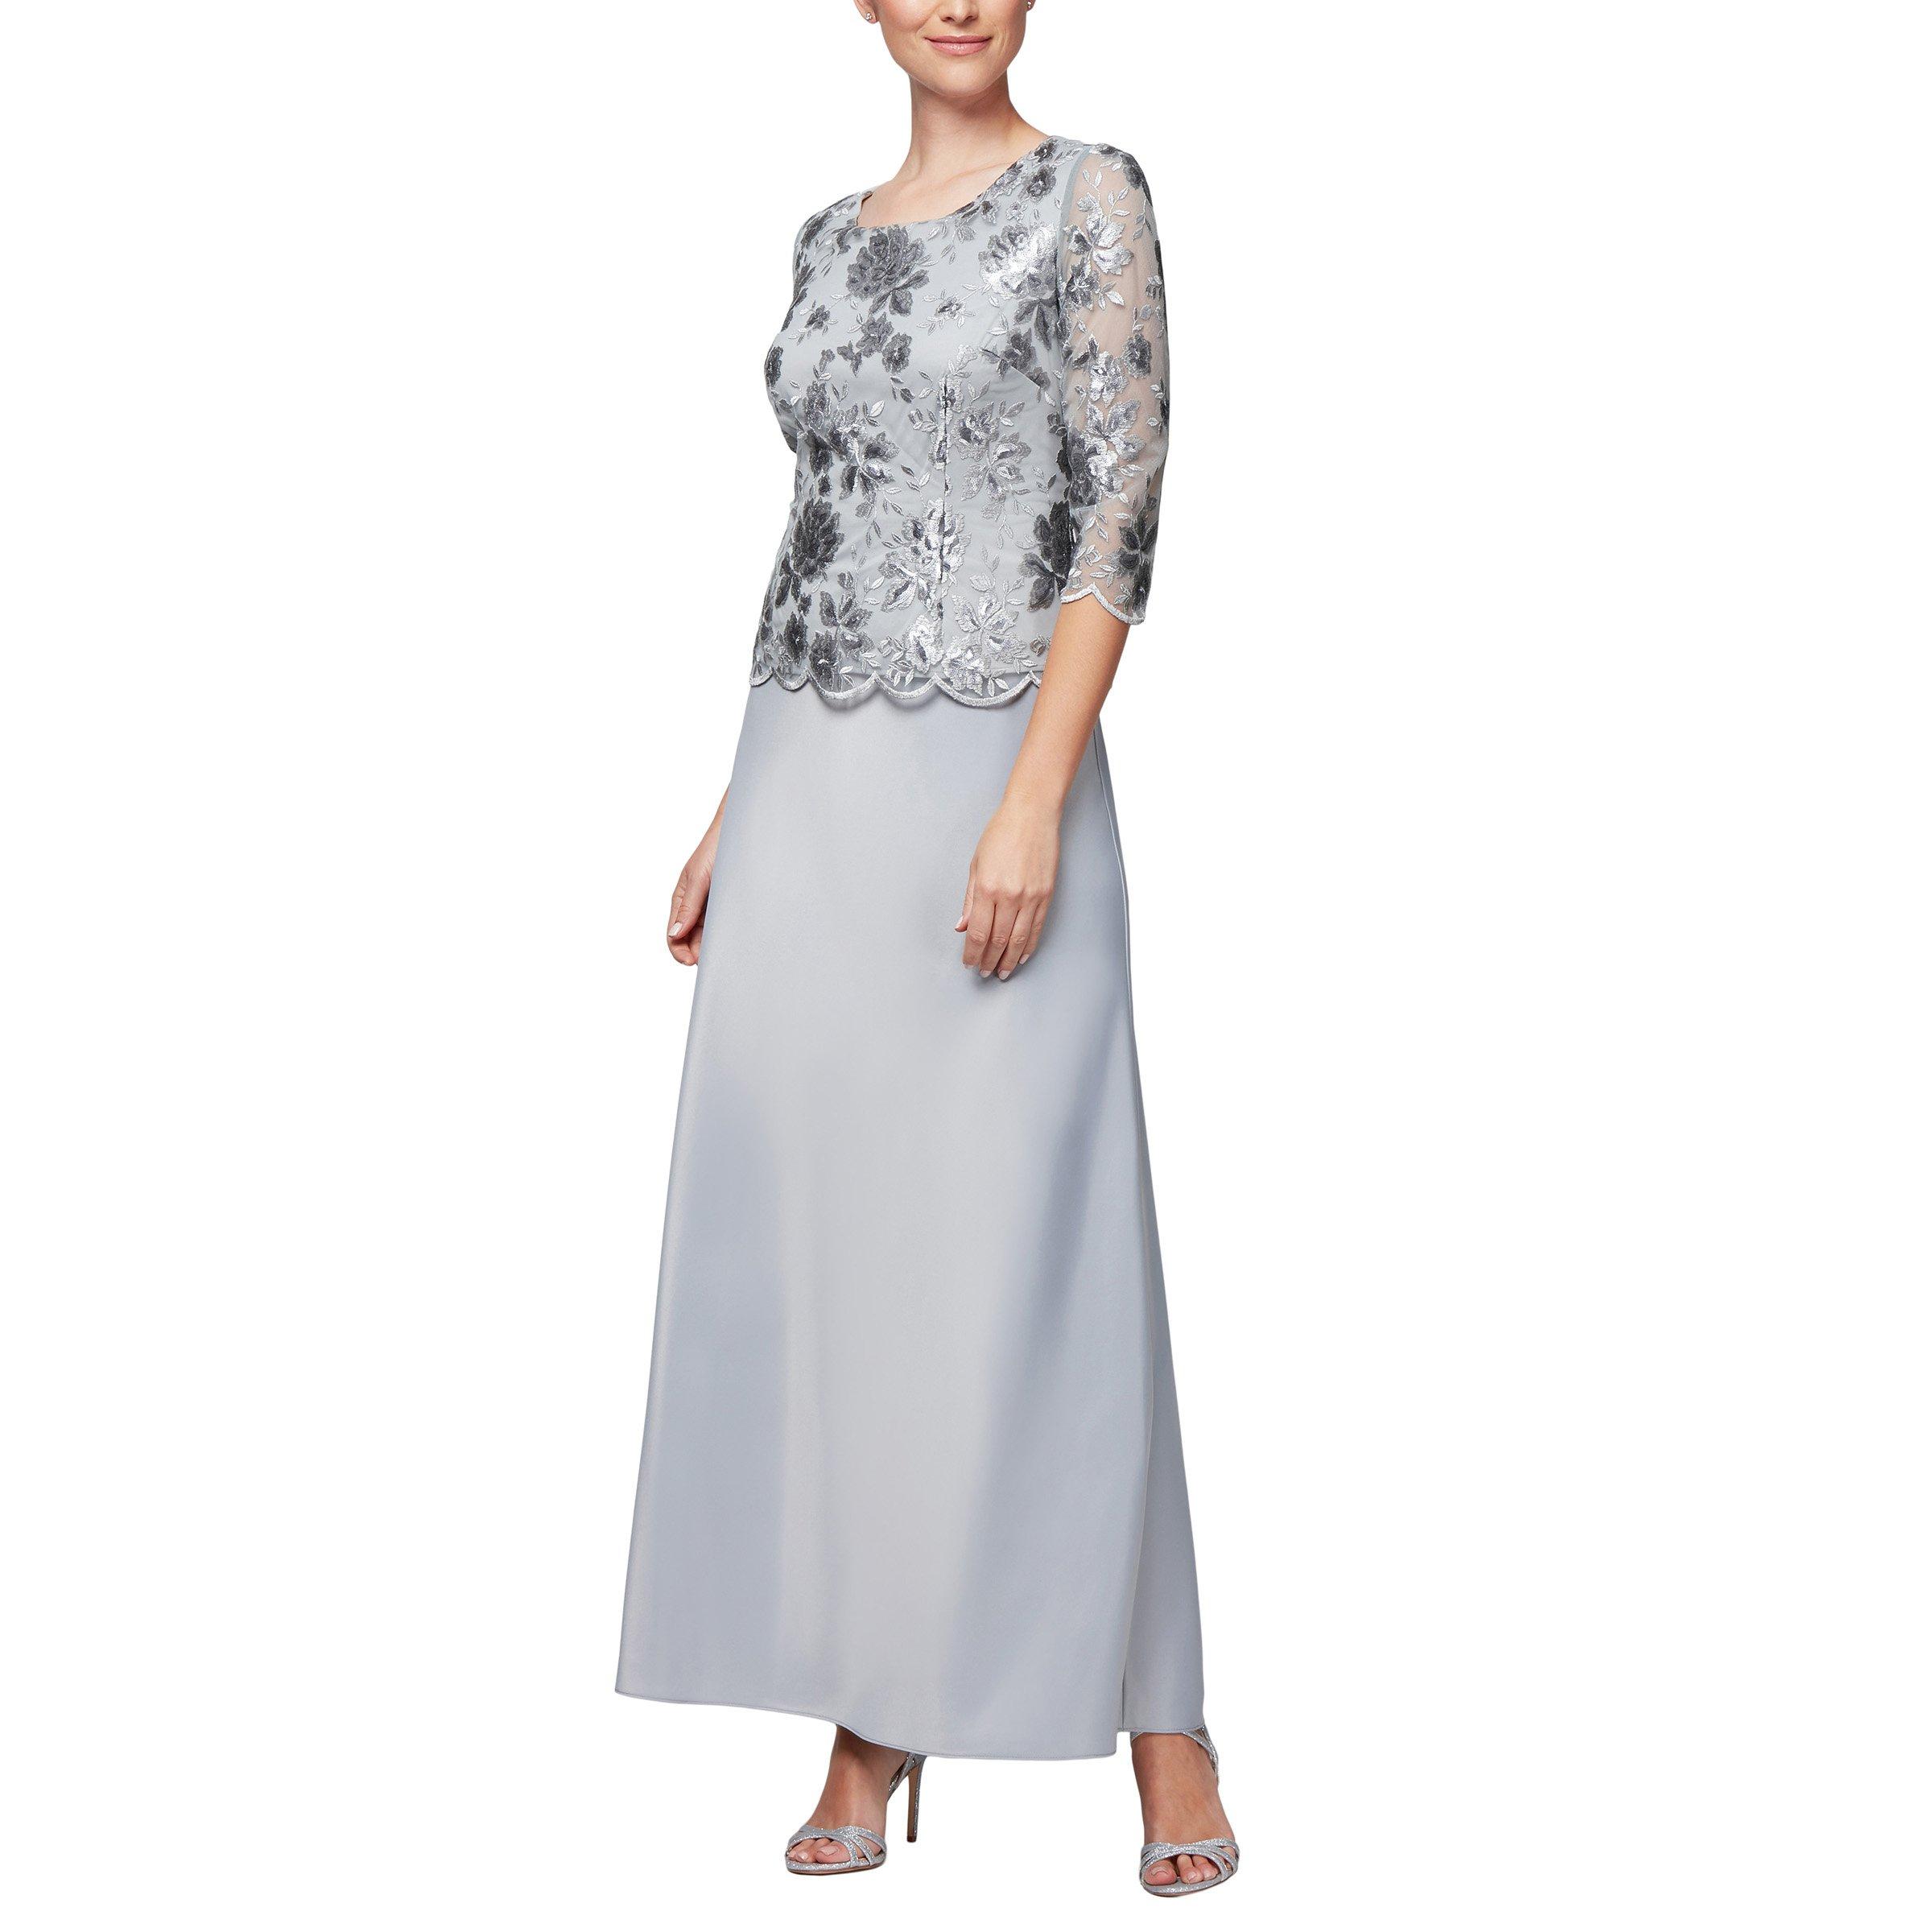 Alex Evenings Women's Long Mock Dress with Full Skirt (Petite and Regular Sizes), Dove, 14